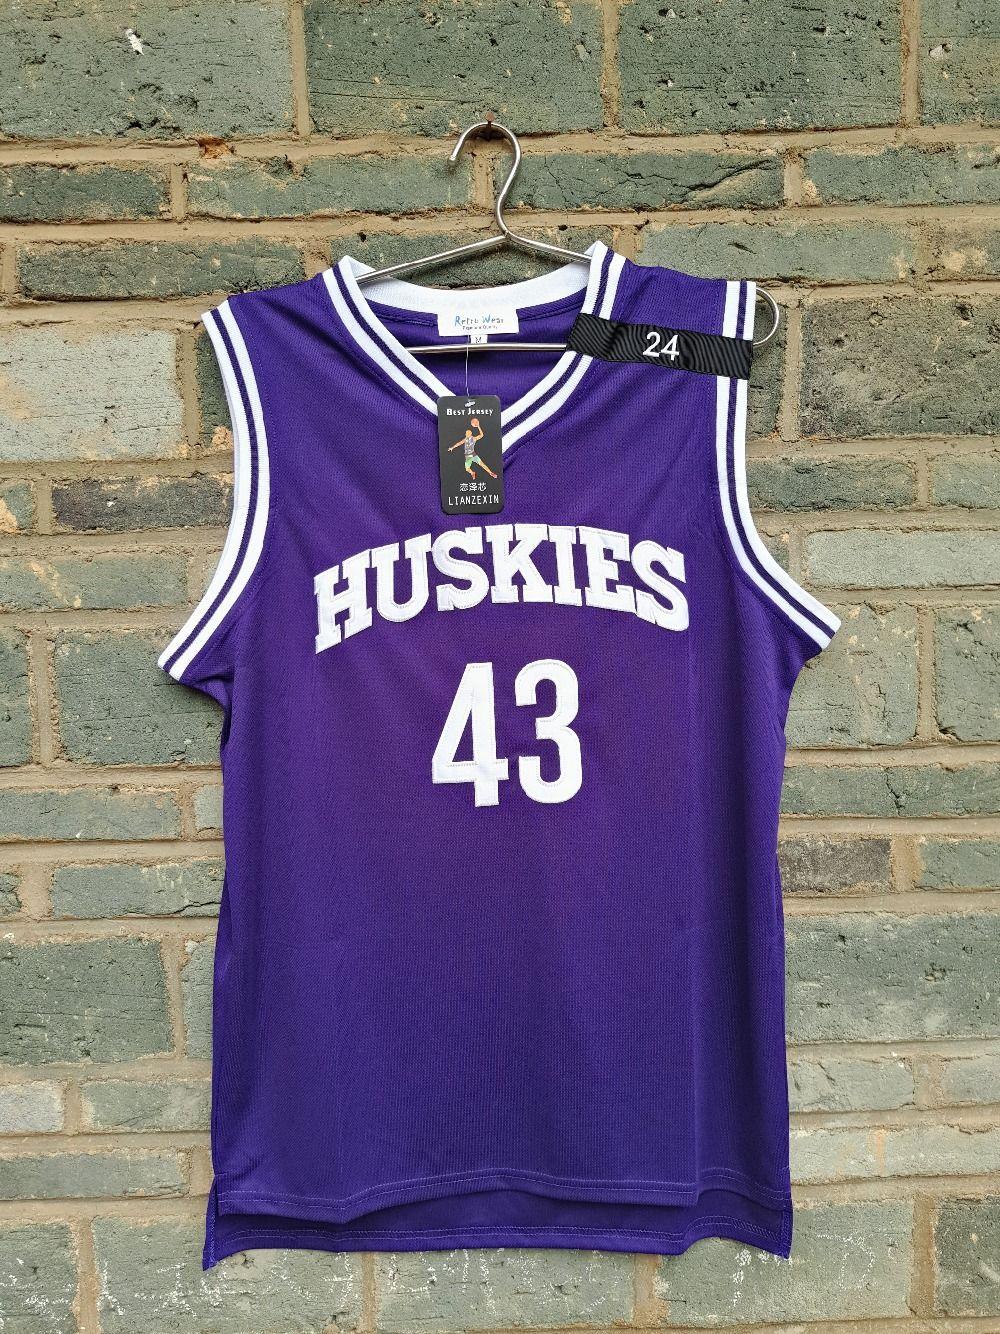 62354cb2294 LIANZEXIN K.Tyler  43 Jersey Huskies The 6th Marlon Wayans Kenny Tyler  Basketball movie Jerseys Purple Color For Men